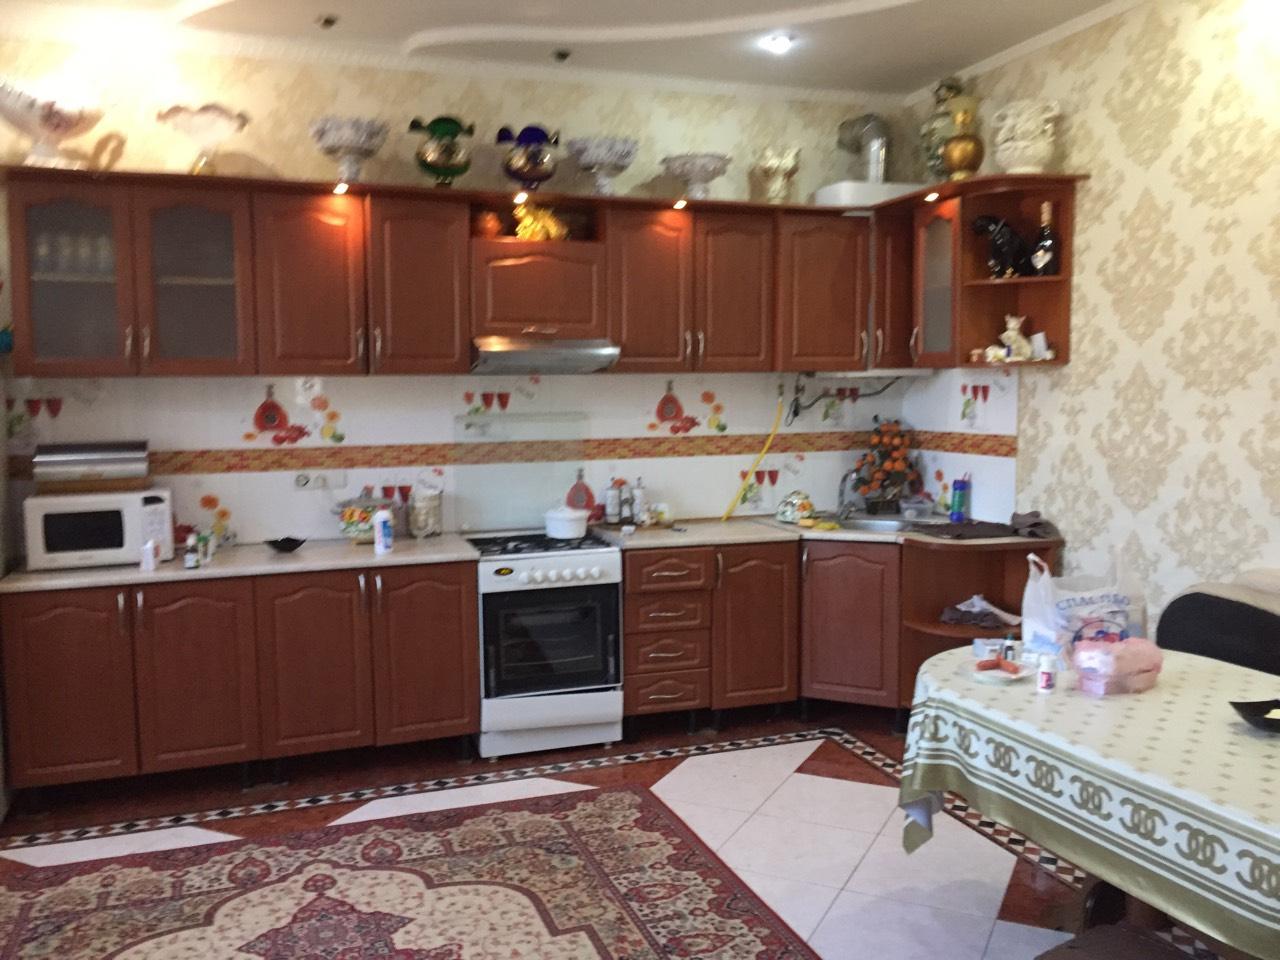 Продается Дом на ул. Проселочная — 140 000 у.е. (фото №7)